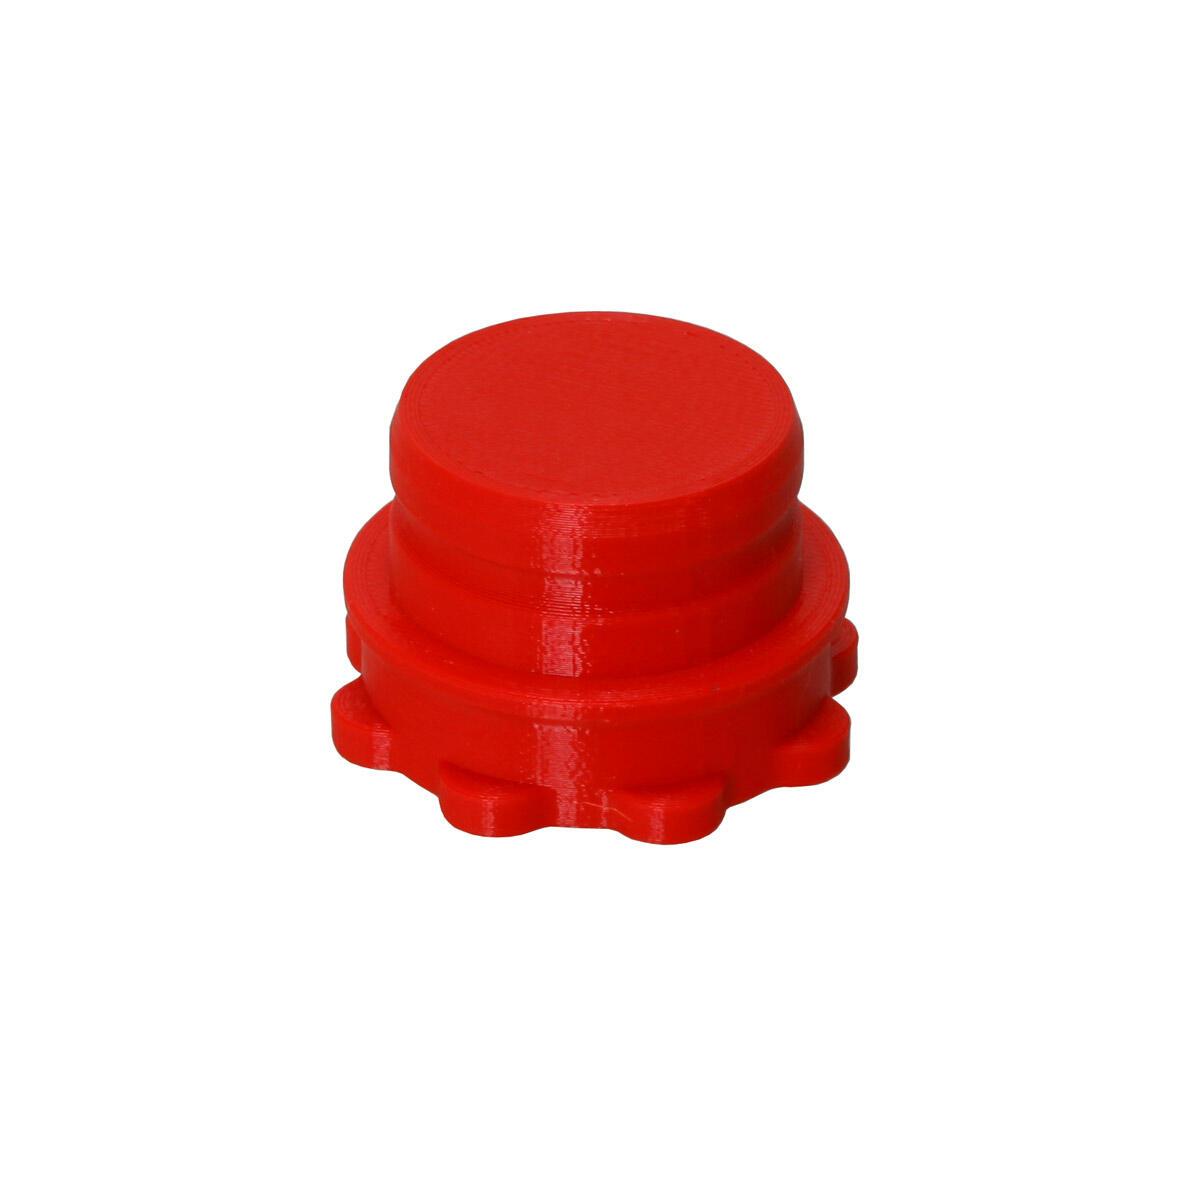 INLET PLUG BUNG DELLORTO 30 Suction hole Protection cap KZ